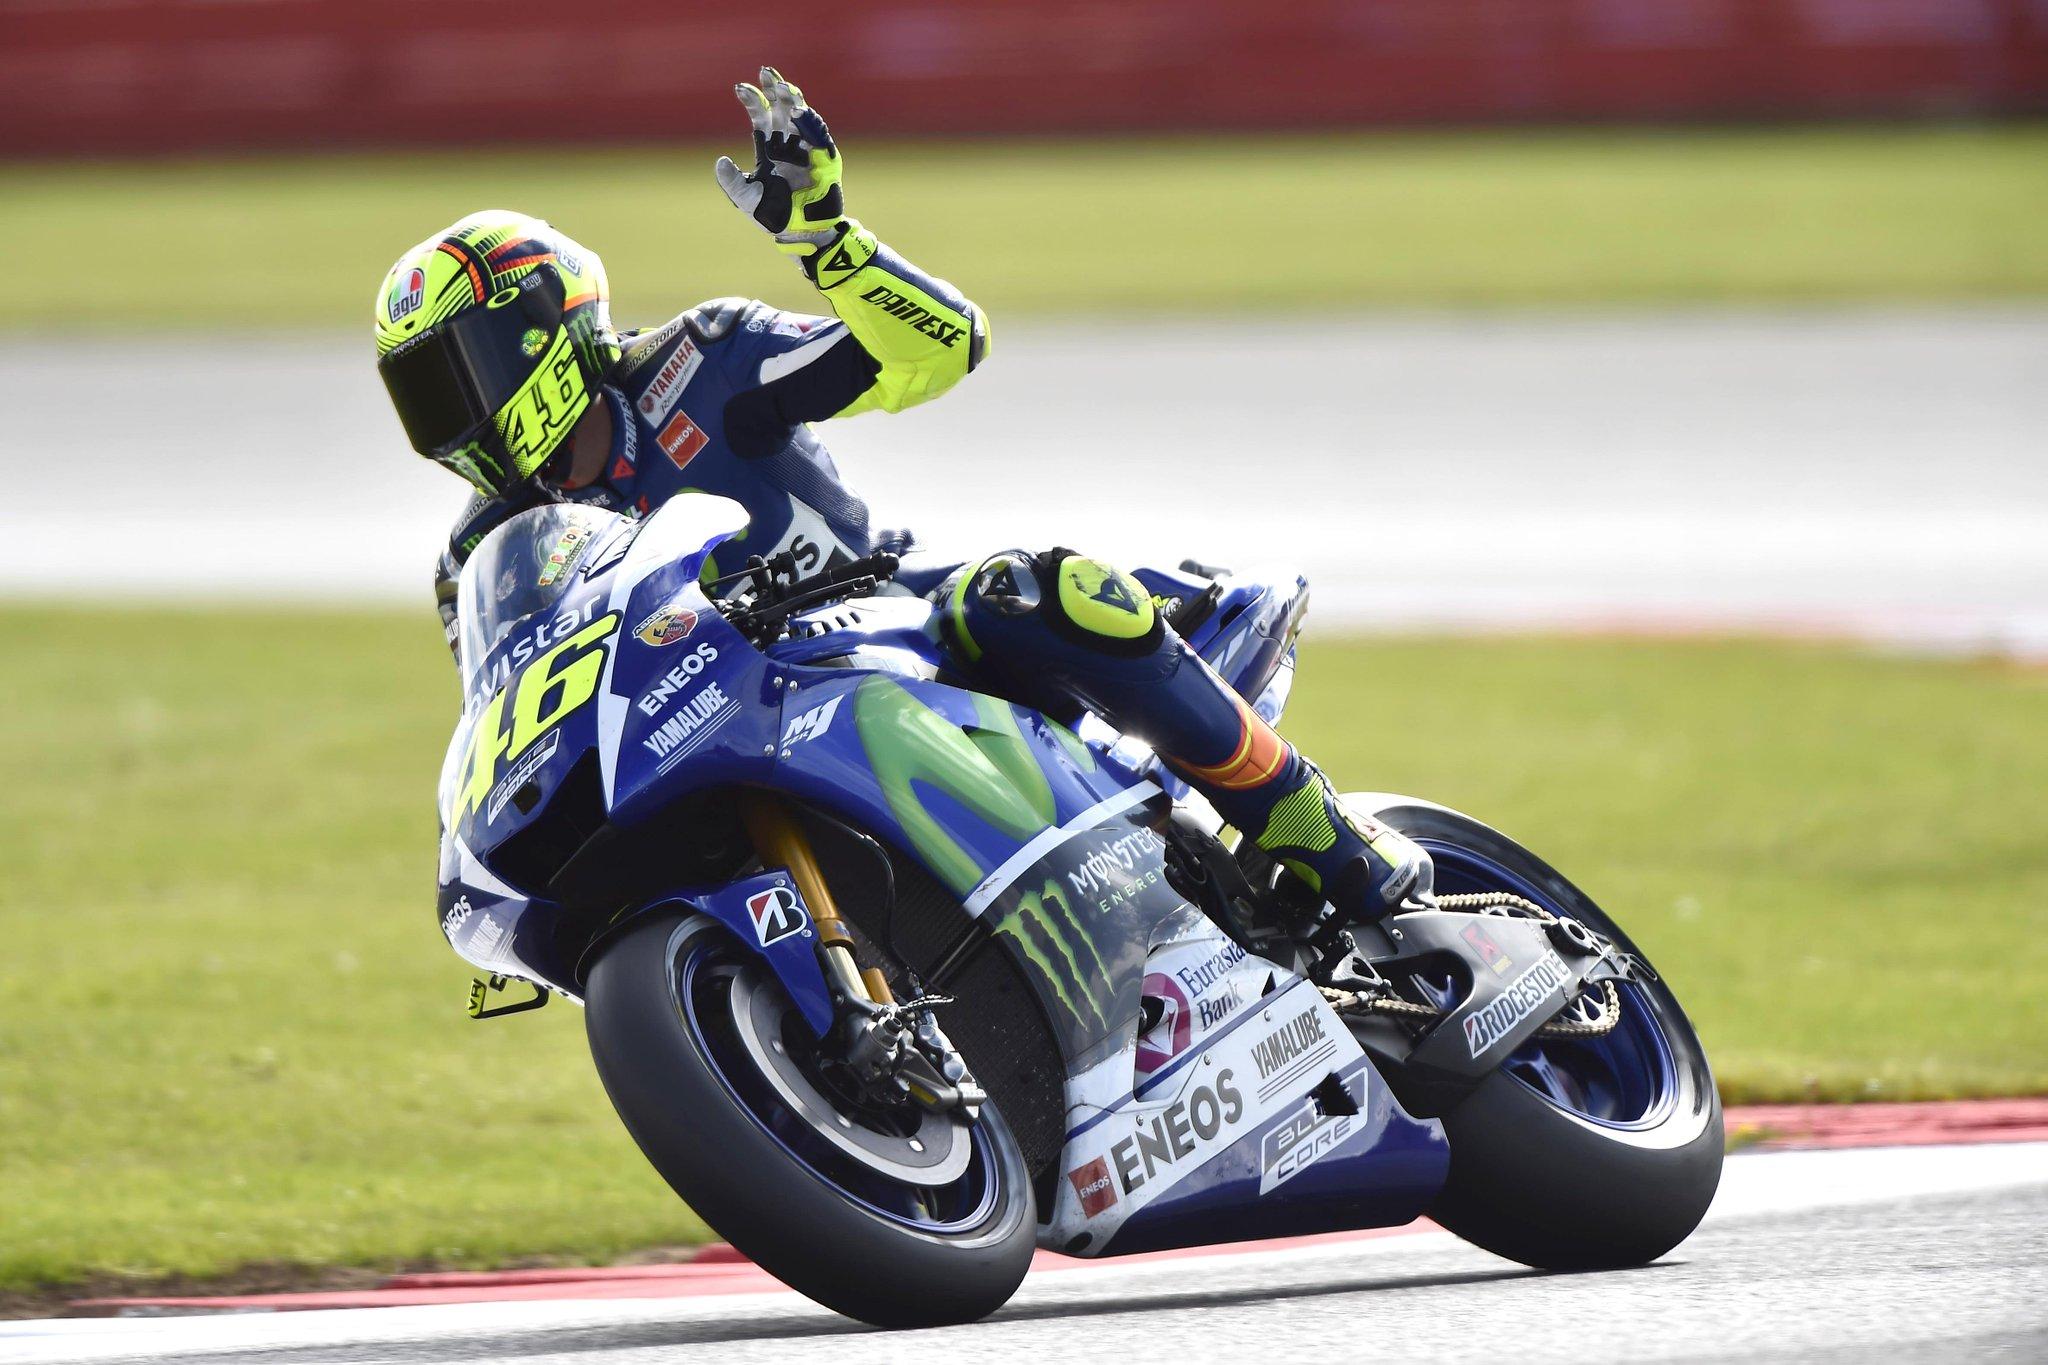 MotoGP 2015 GP Gran Bretagna: Griglia di partenza a Silverstone, partenza oggi in Diretta TV Streaming